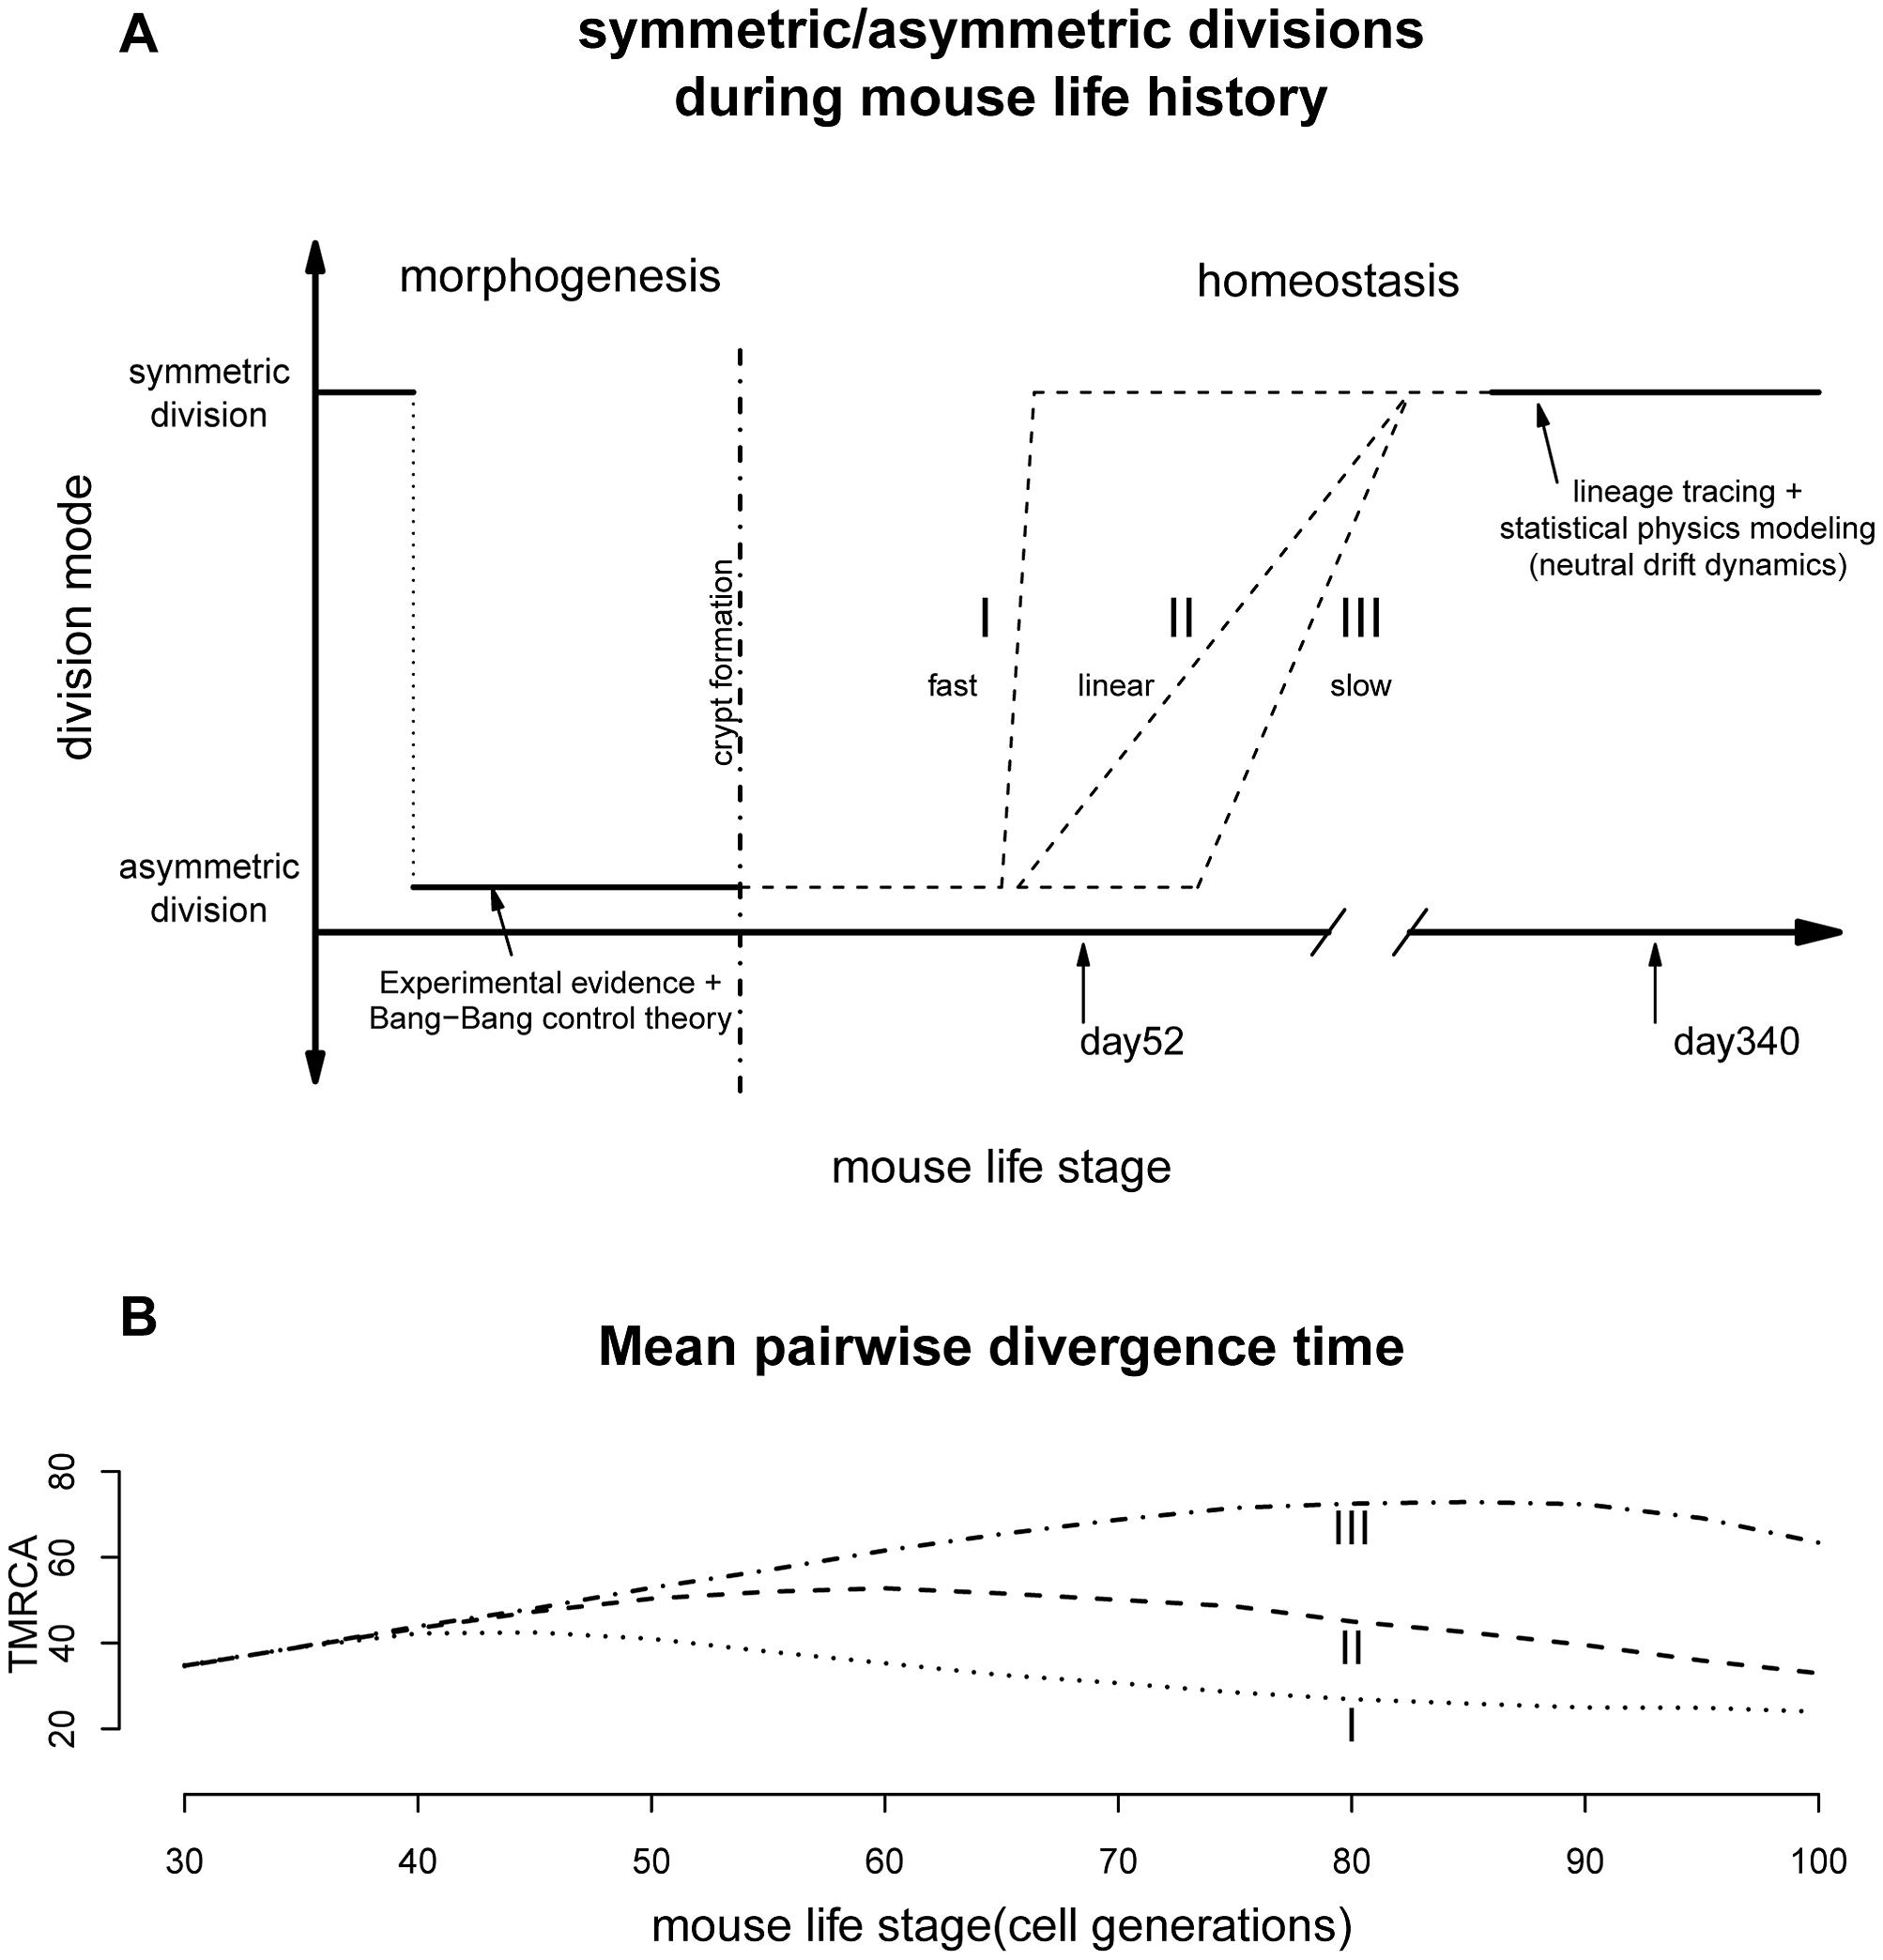 Lifelong equilibrium for stem cell symmetric/asymmetric divisions.